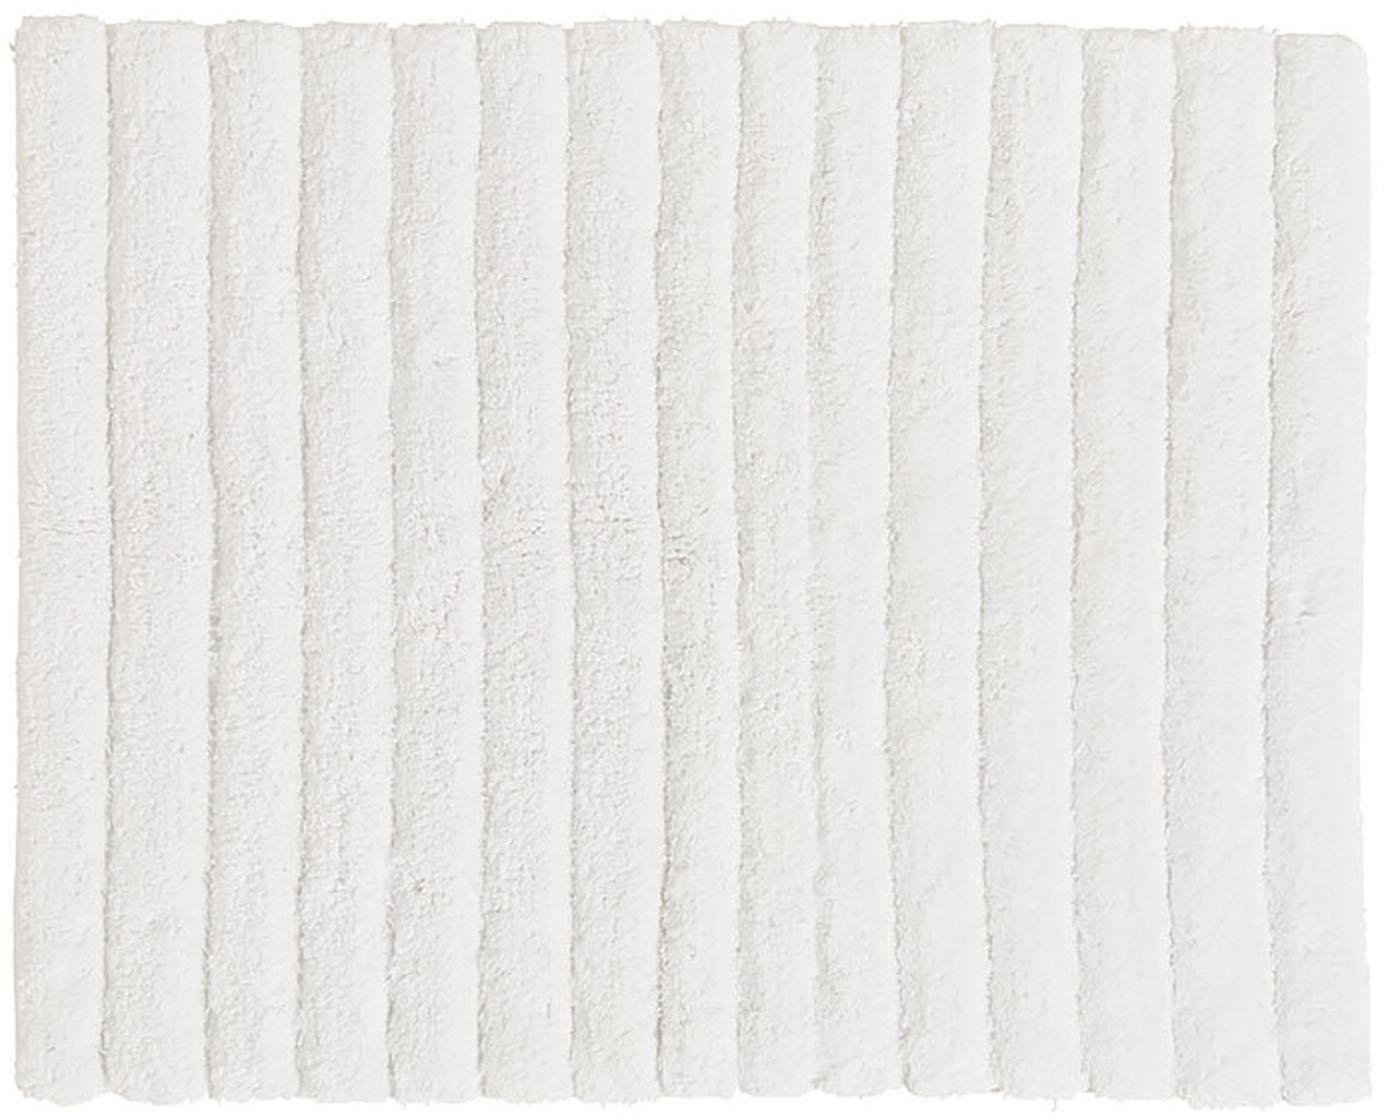 Alfombrilla de baño Board, Algodón Gramaje superior 1900g/m², Blanco, An 50 x L 60 cm